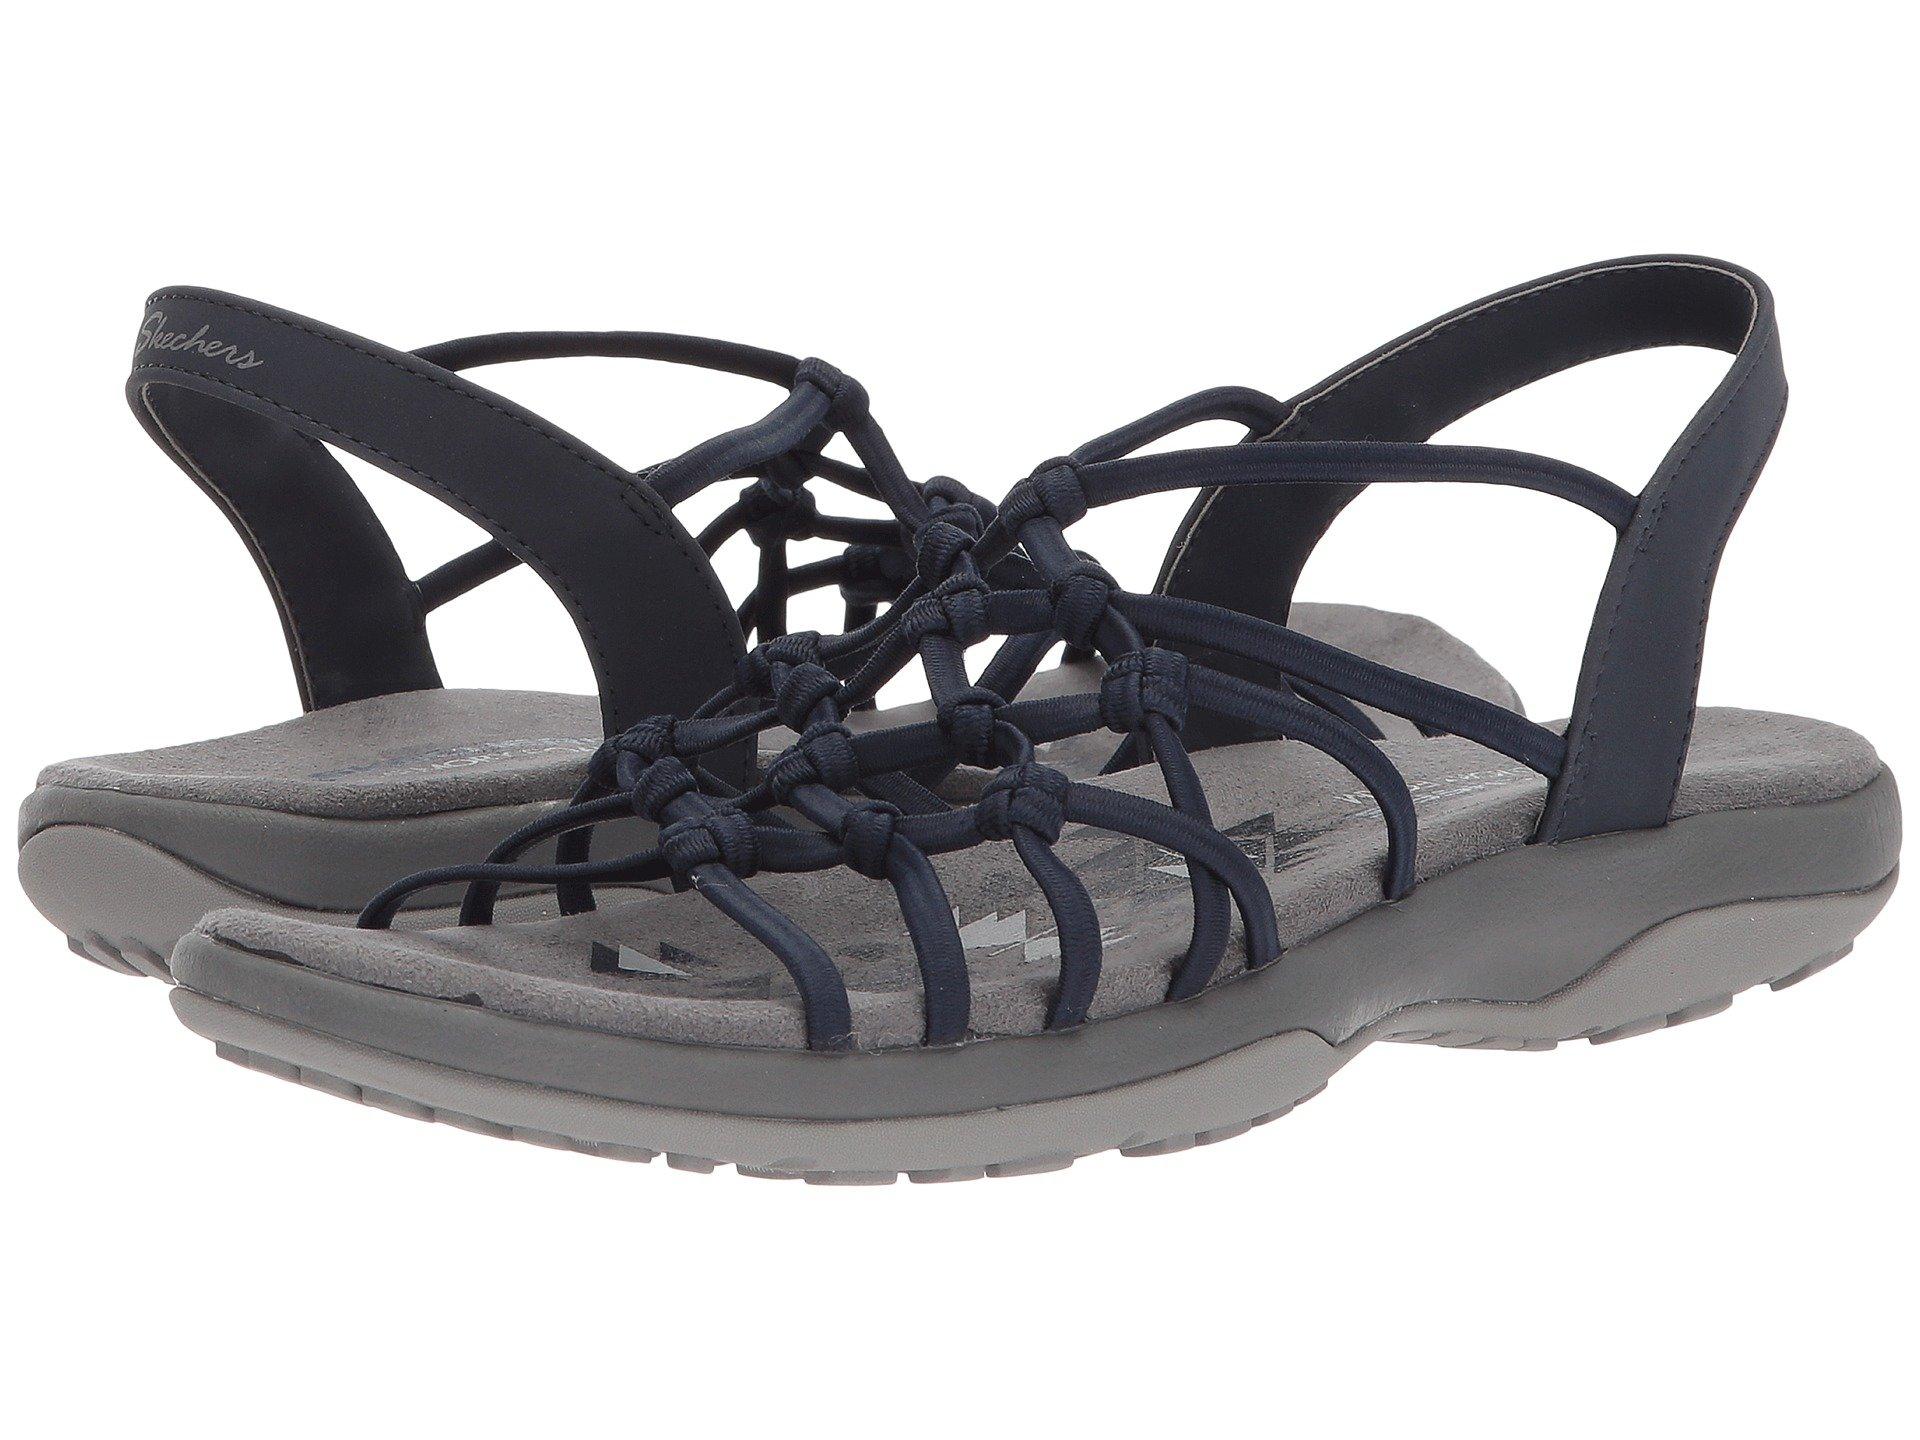 bd00f3515 Women s SKECHERS Sandals + FREE SHIPPING